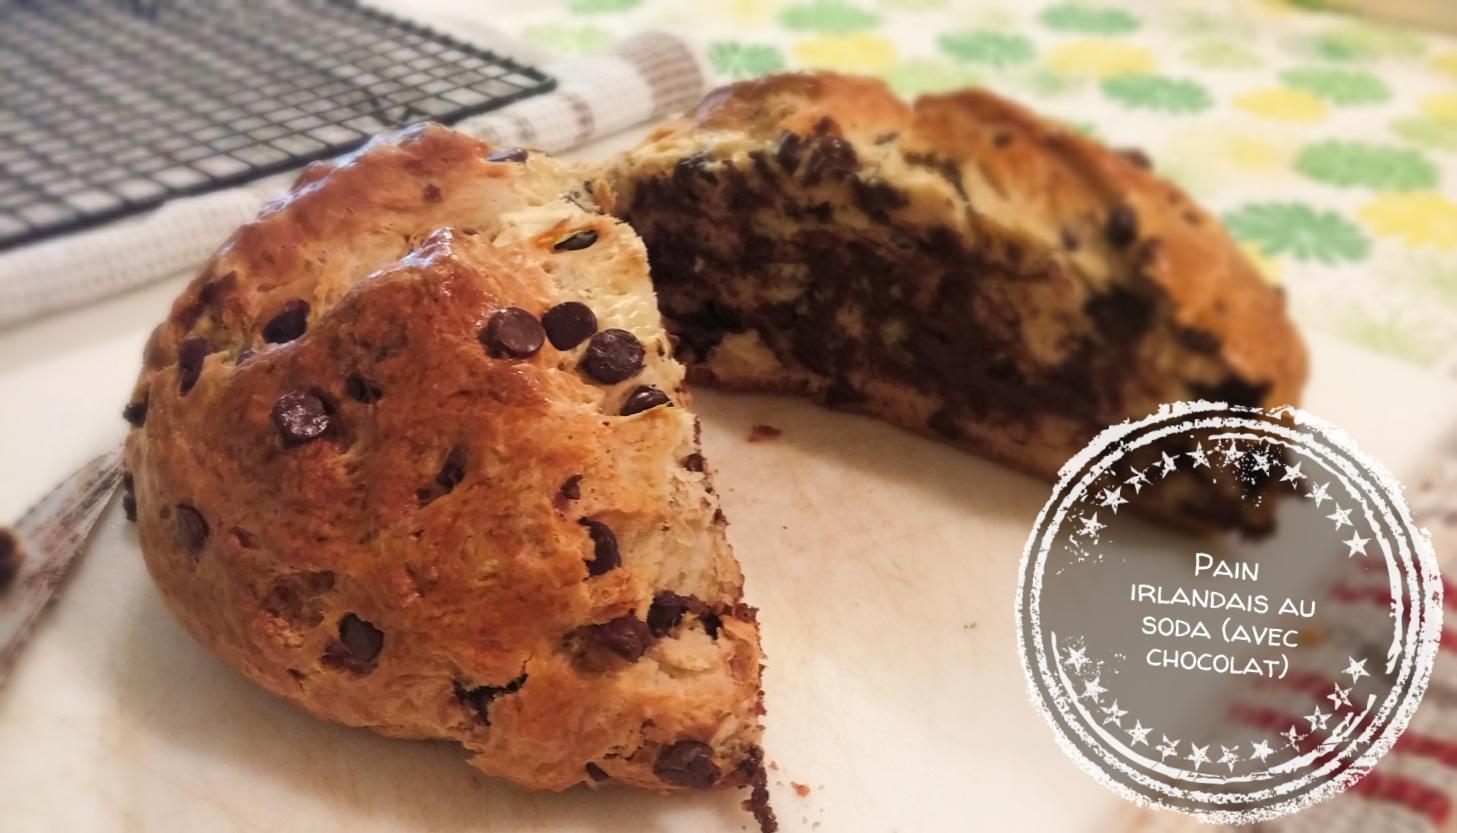 Pain irlandais au soda (avec chocolat) - Auboutdelalangue.com